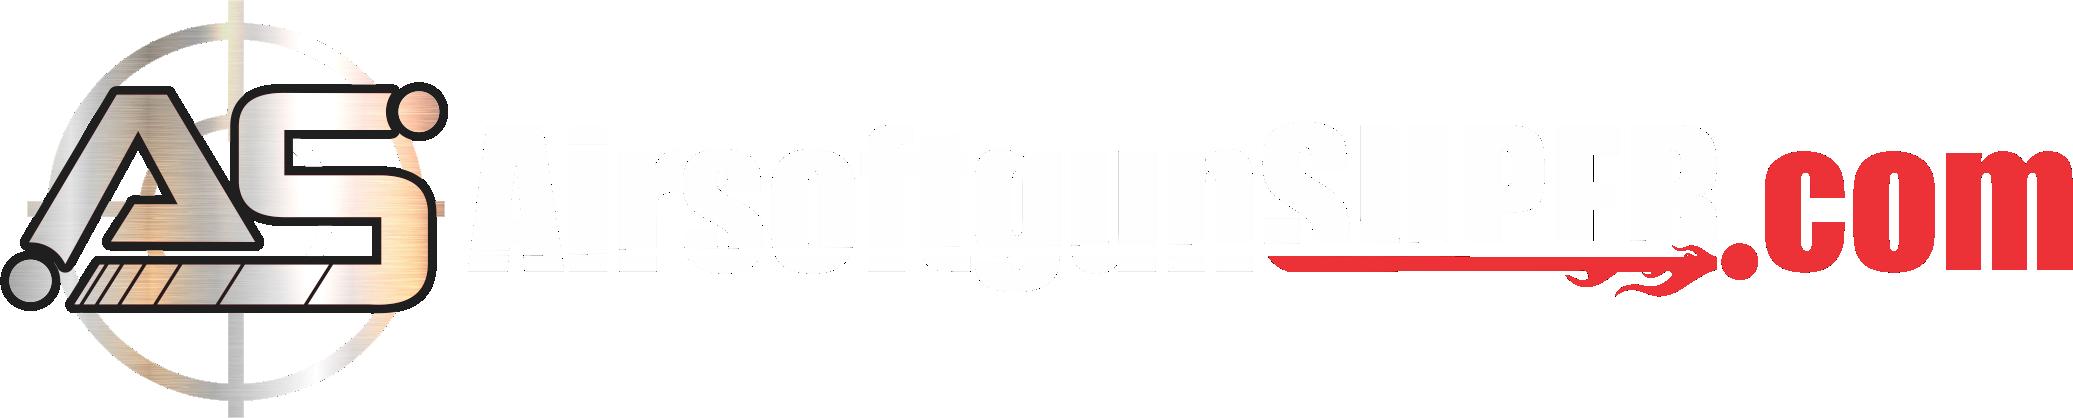 Airsoft Gun ASGSuper